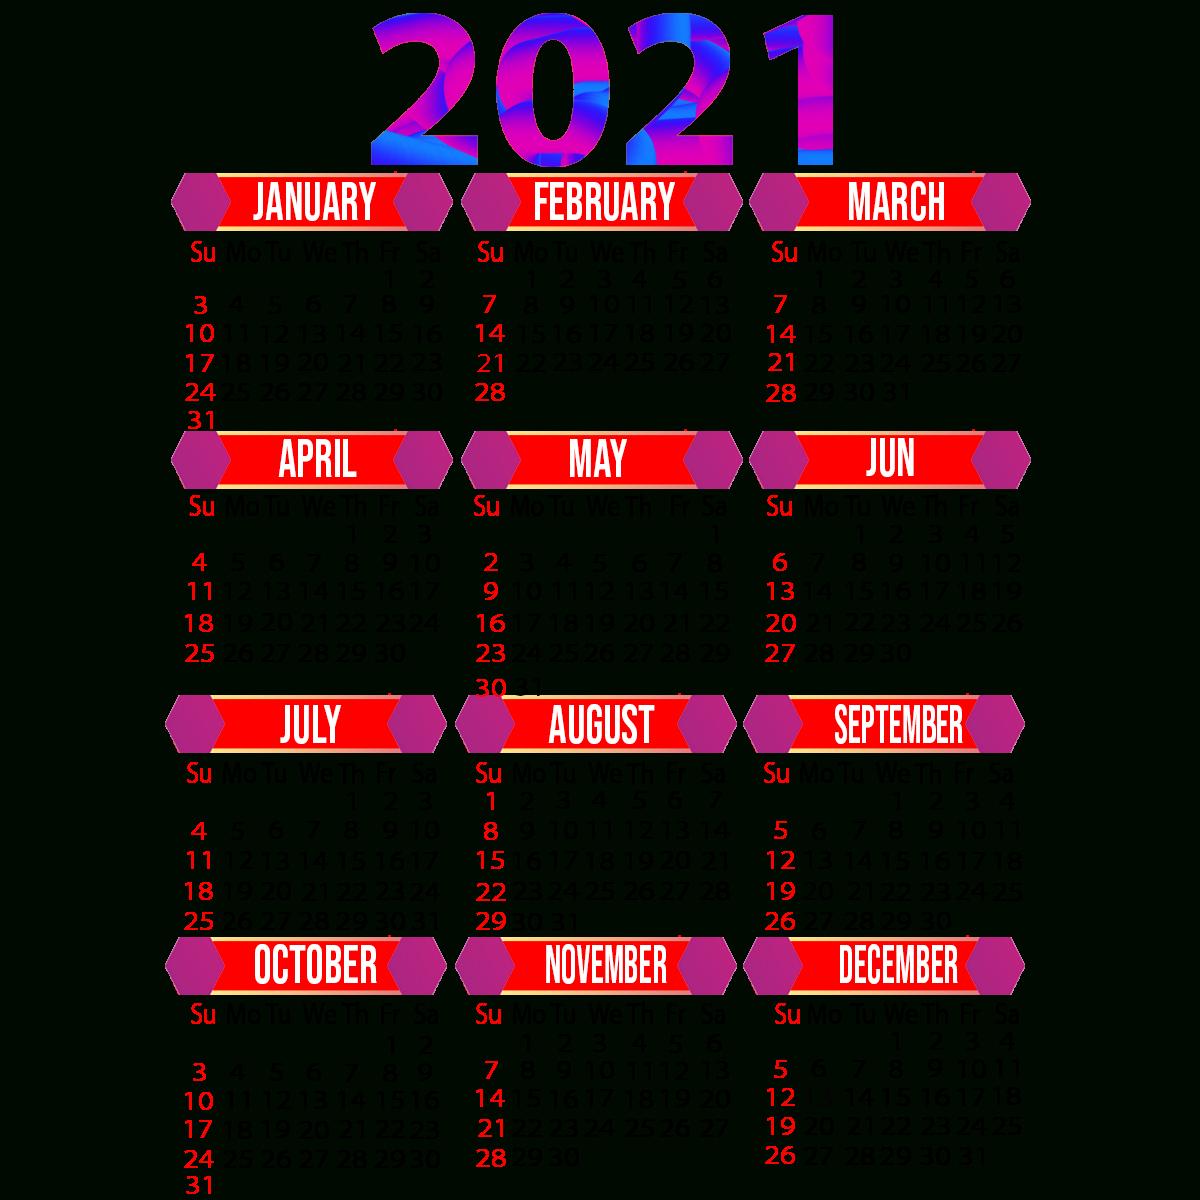 2021 Calendar Printable | 12 Months All In One | Calendar 2021 pertaining to Calendar 2021 All Months